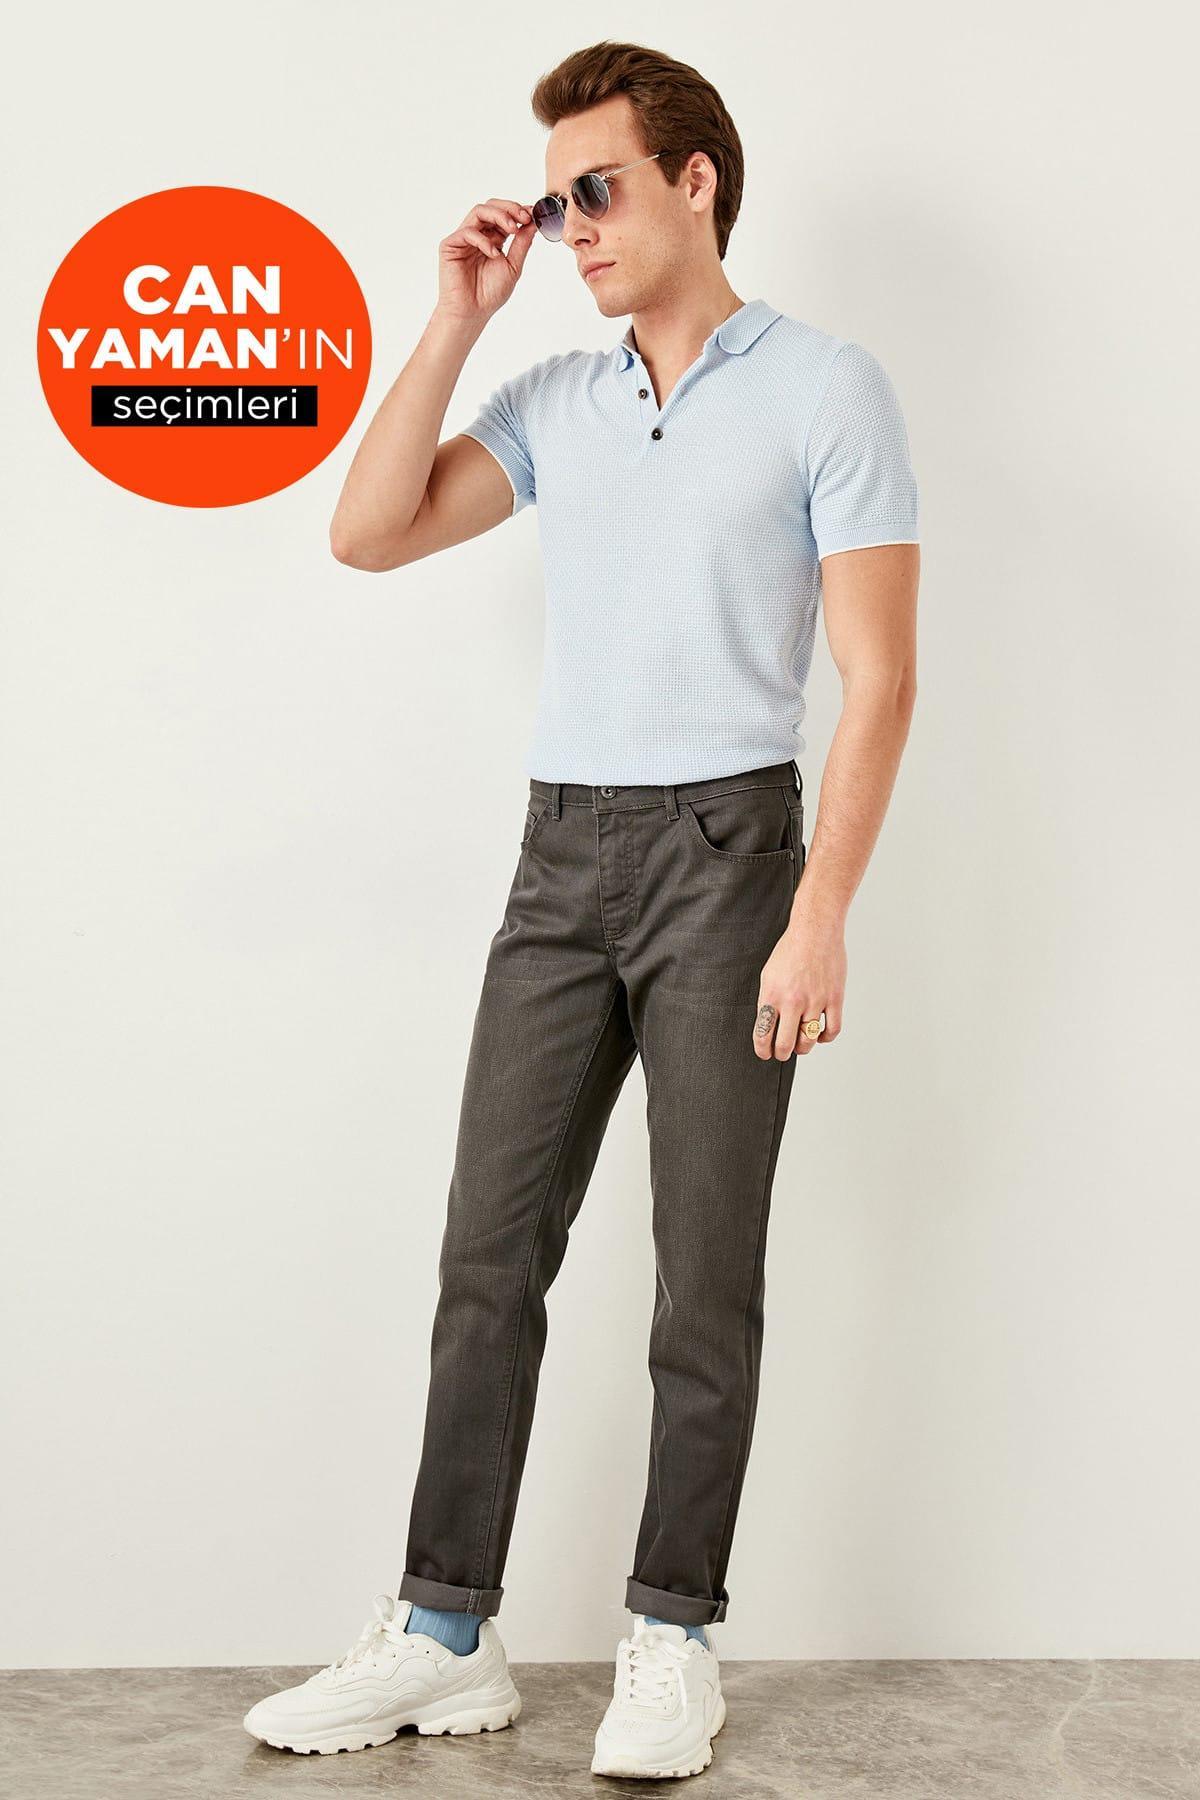 Women's Clothing Persevering Trendyol Man Anthracite Men Coated Jean-slim Fit Flexible Fabric Denim Pants Tmnss19oe0007 100% Original Jeans